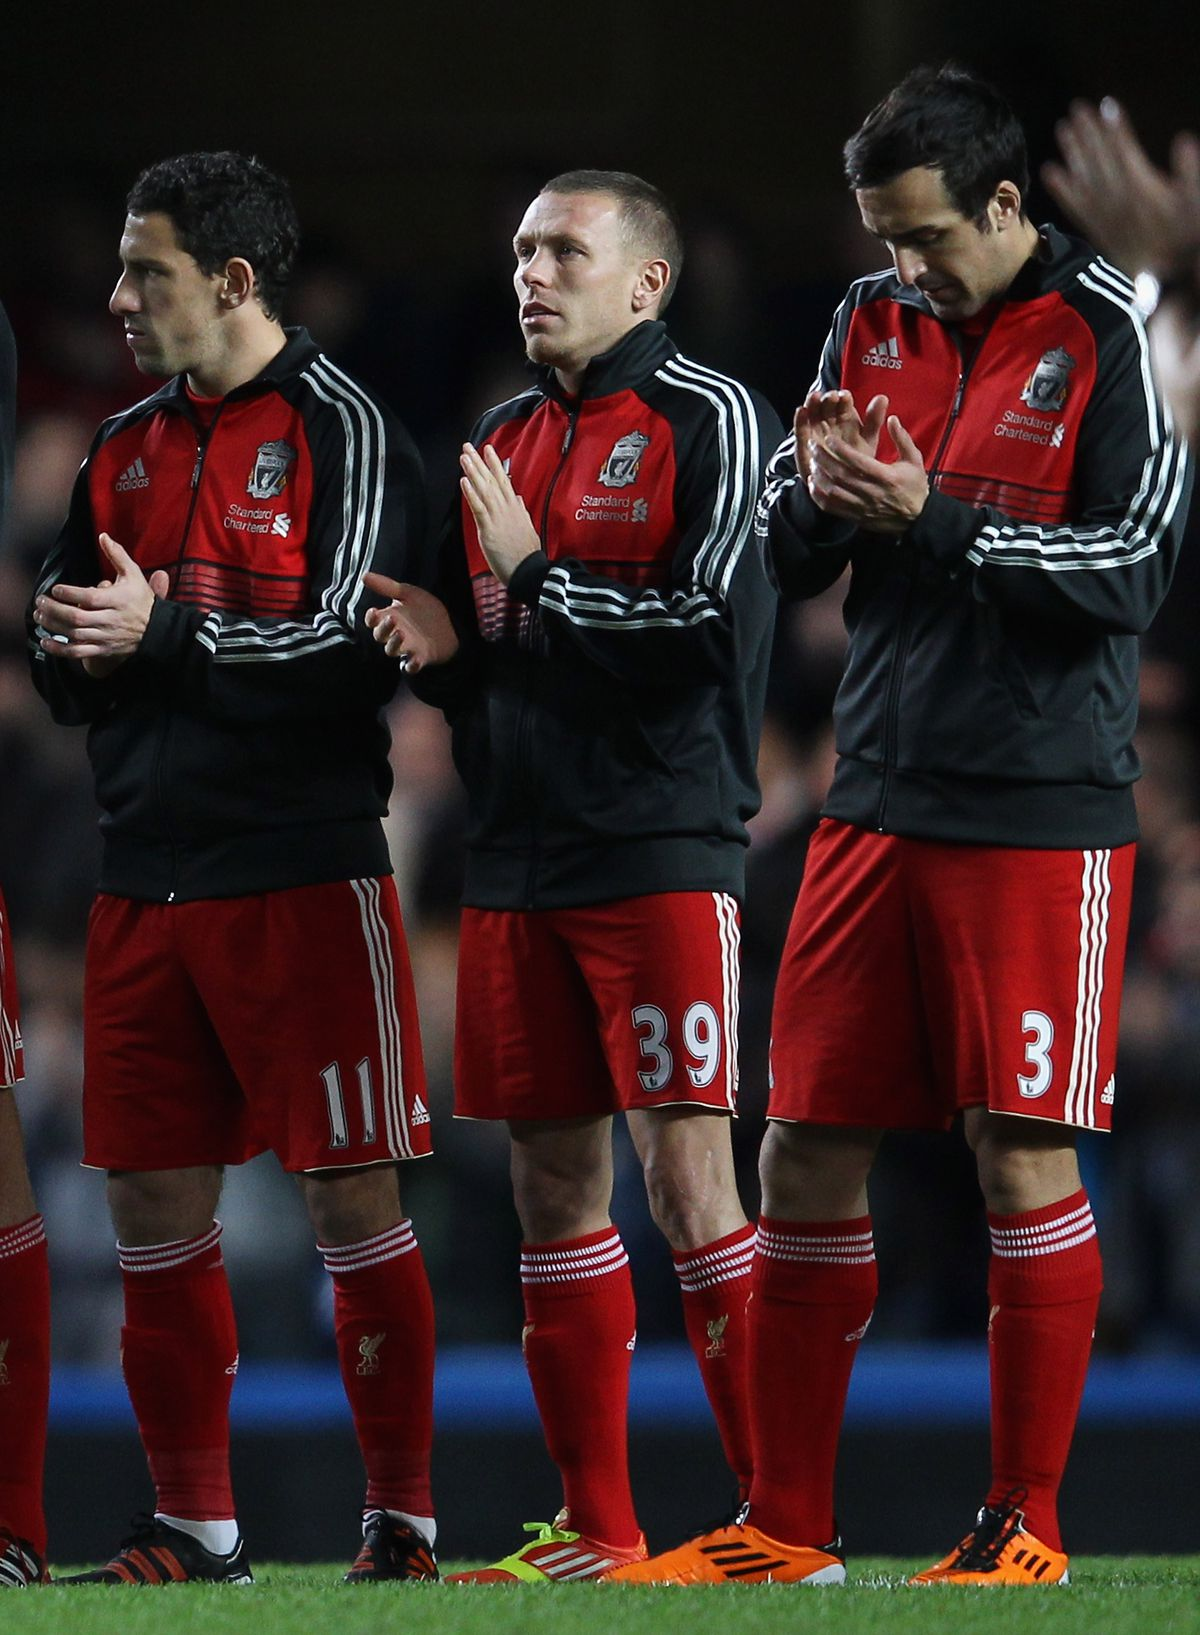 Chelsea v Liverpool - Carling Cup Quarter Final